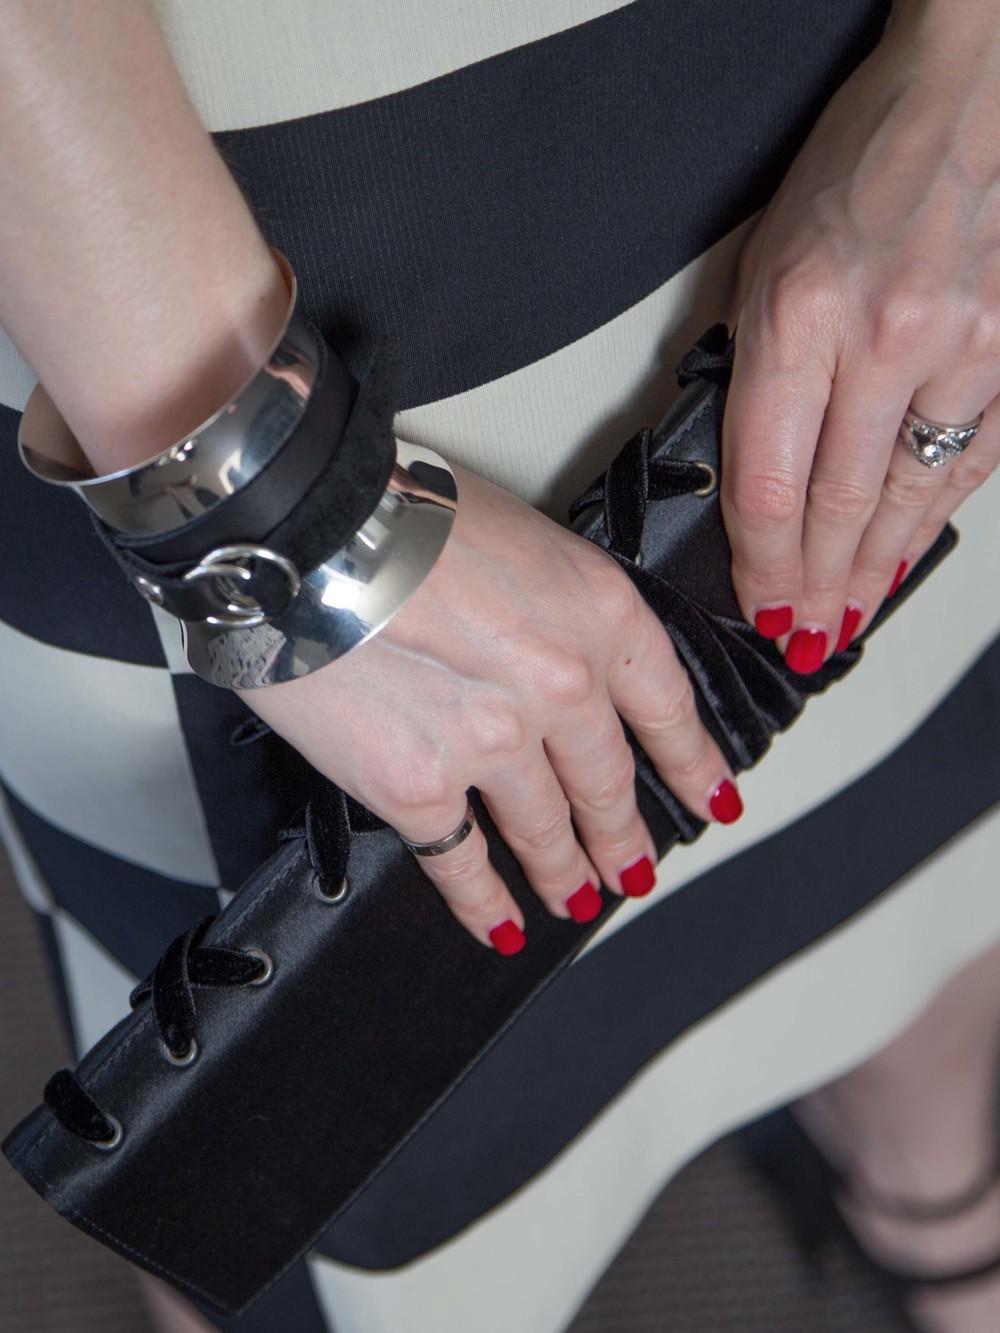 Lanvin Striped Dress, Georg Jensen Cuff, Yves Saint Laurent Vintage Clutch, Lanvin Silk Satin Heels, Cartier Love Ring, Engagement & Wedding Rings